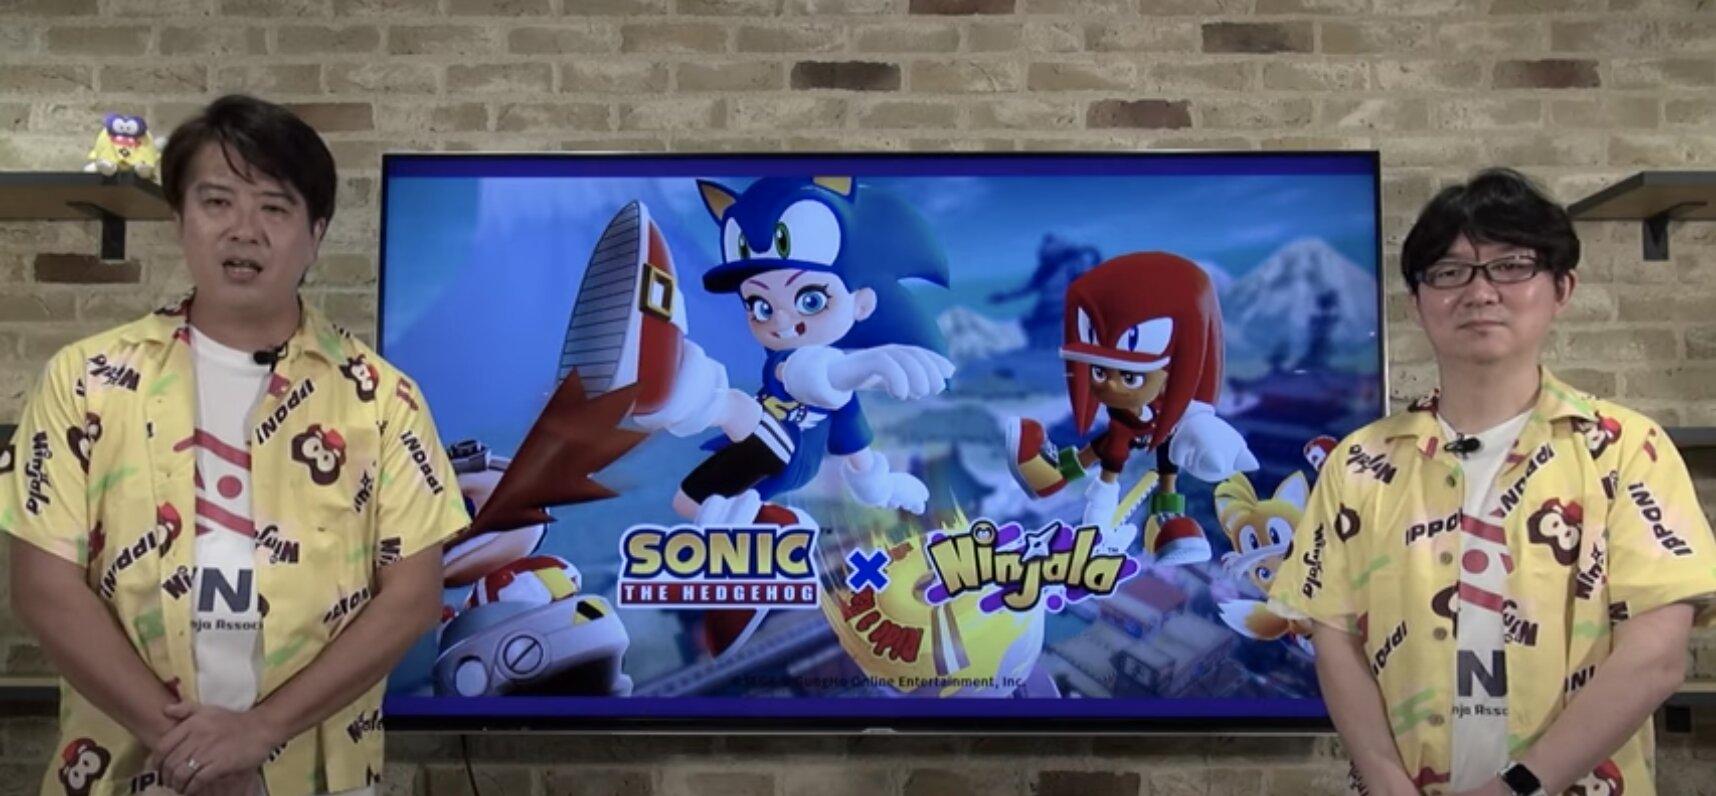 Ninjala, Sonic the Hedgehog collaboration, Dev Diary